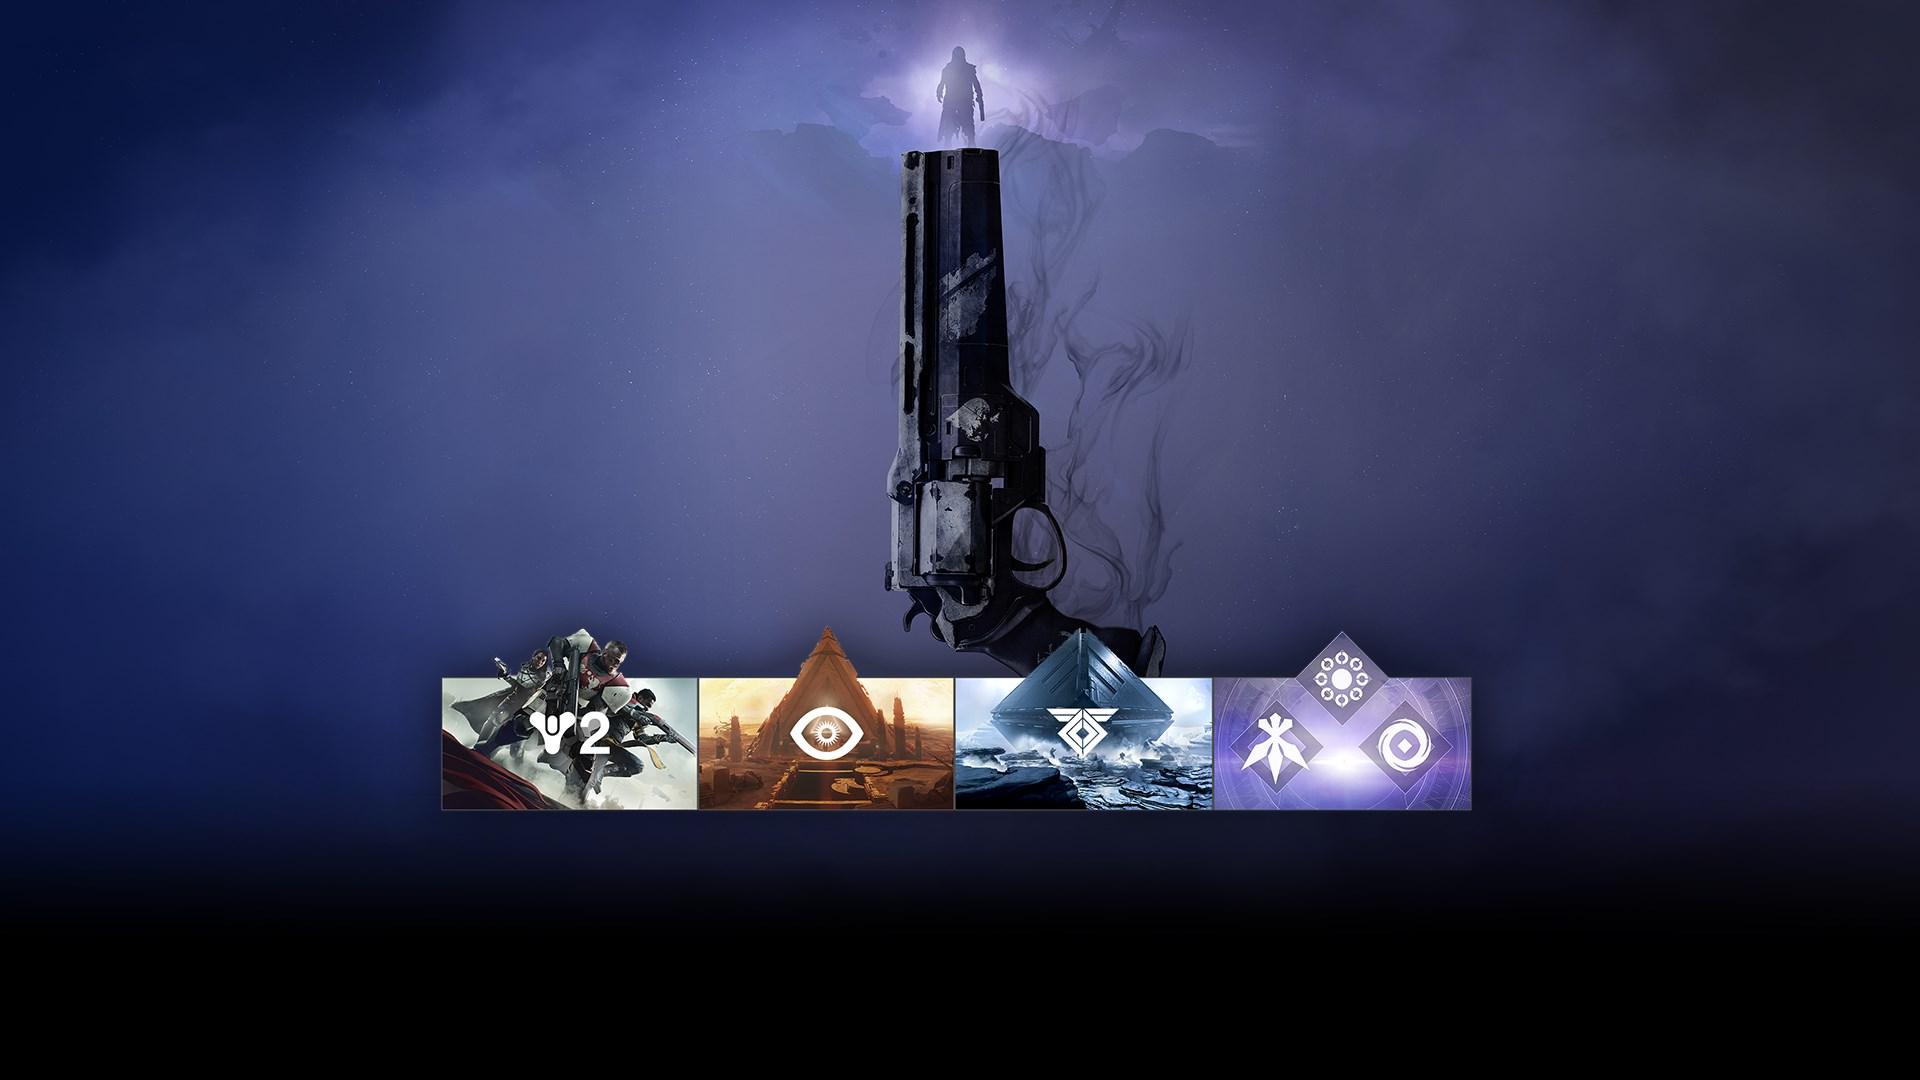 destiny 2 pc key free